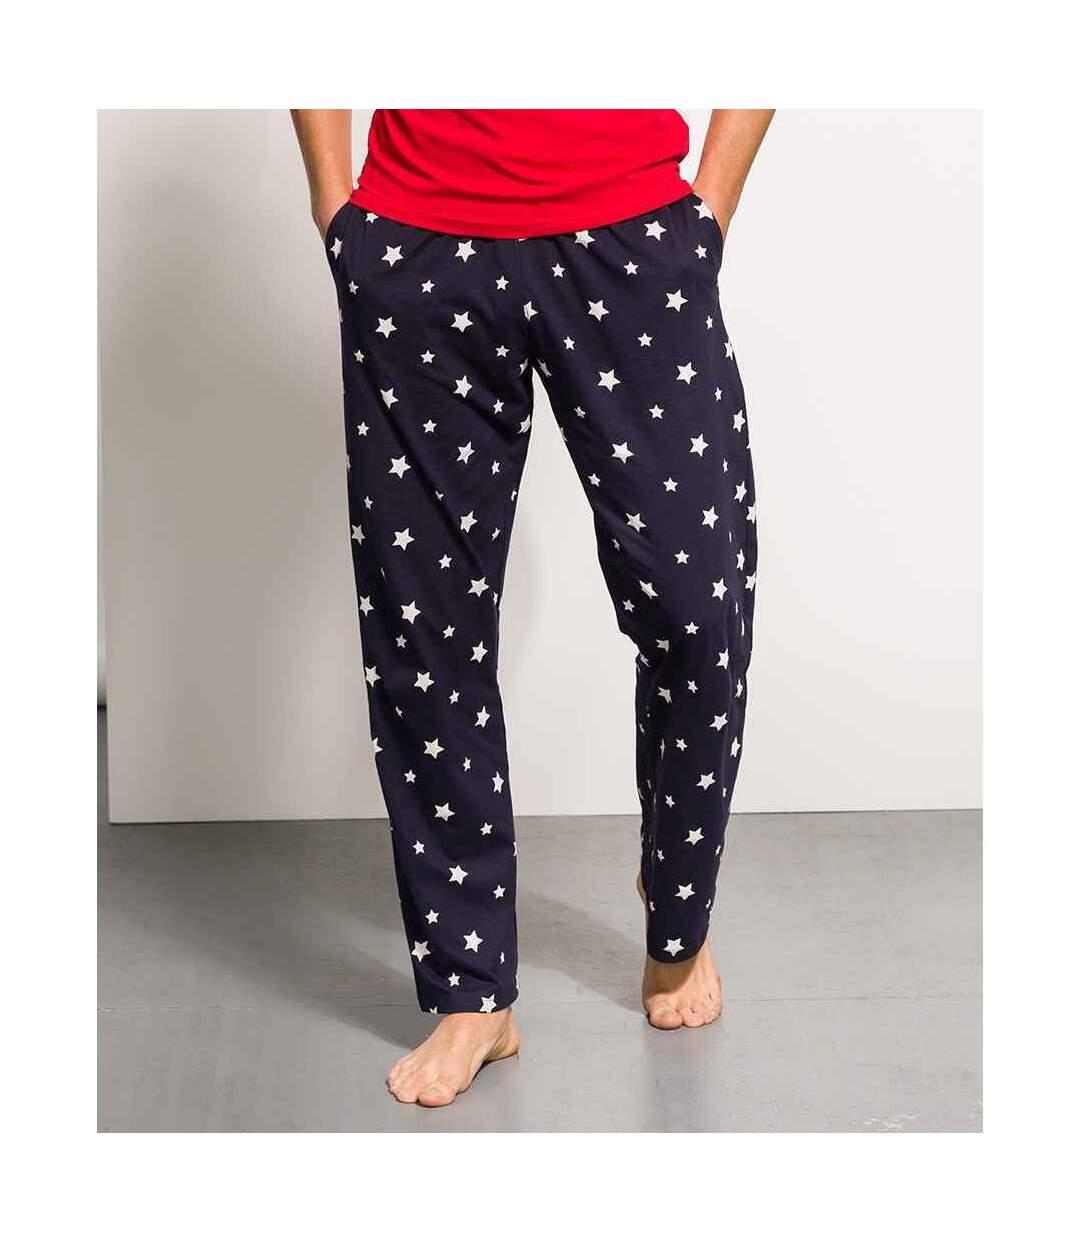 Skinni Fit Mens Lounge Pants (Navy/White) - UTRW7996